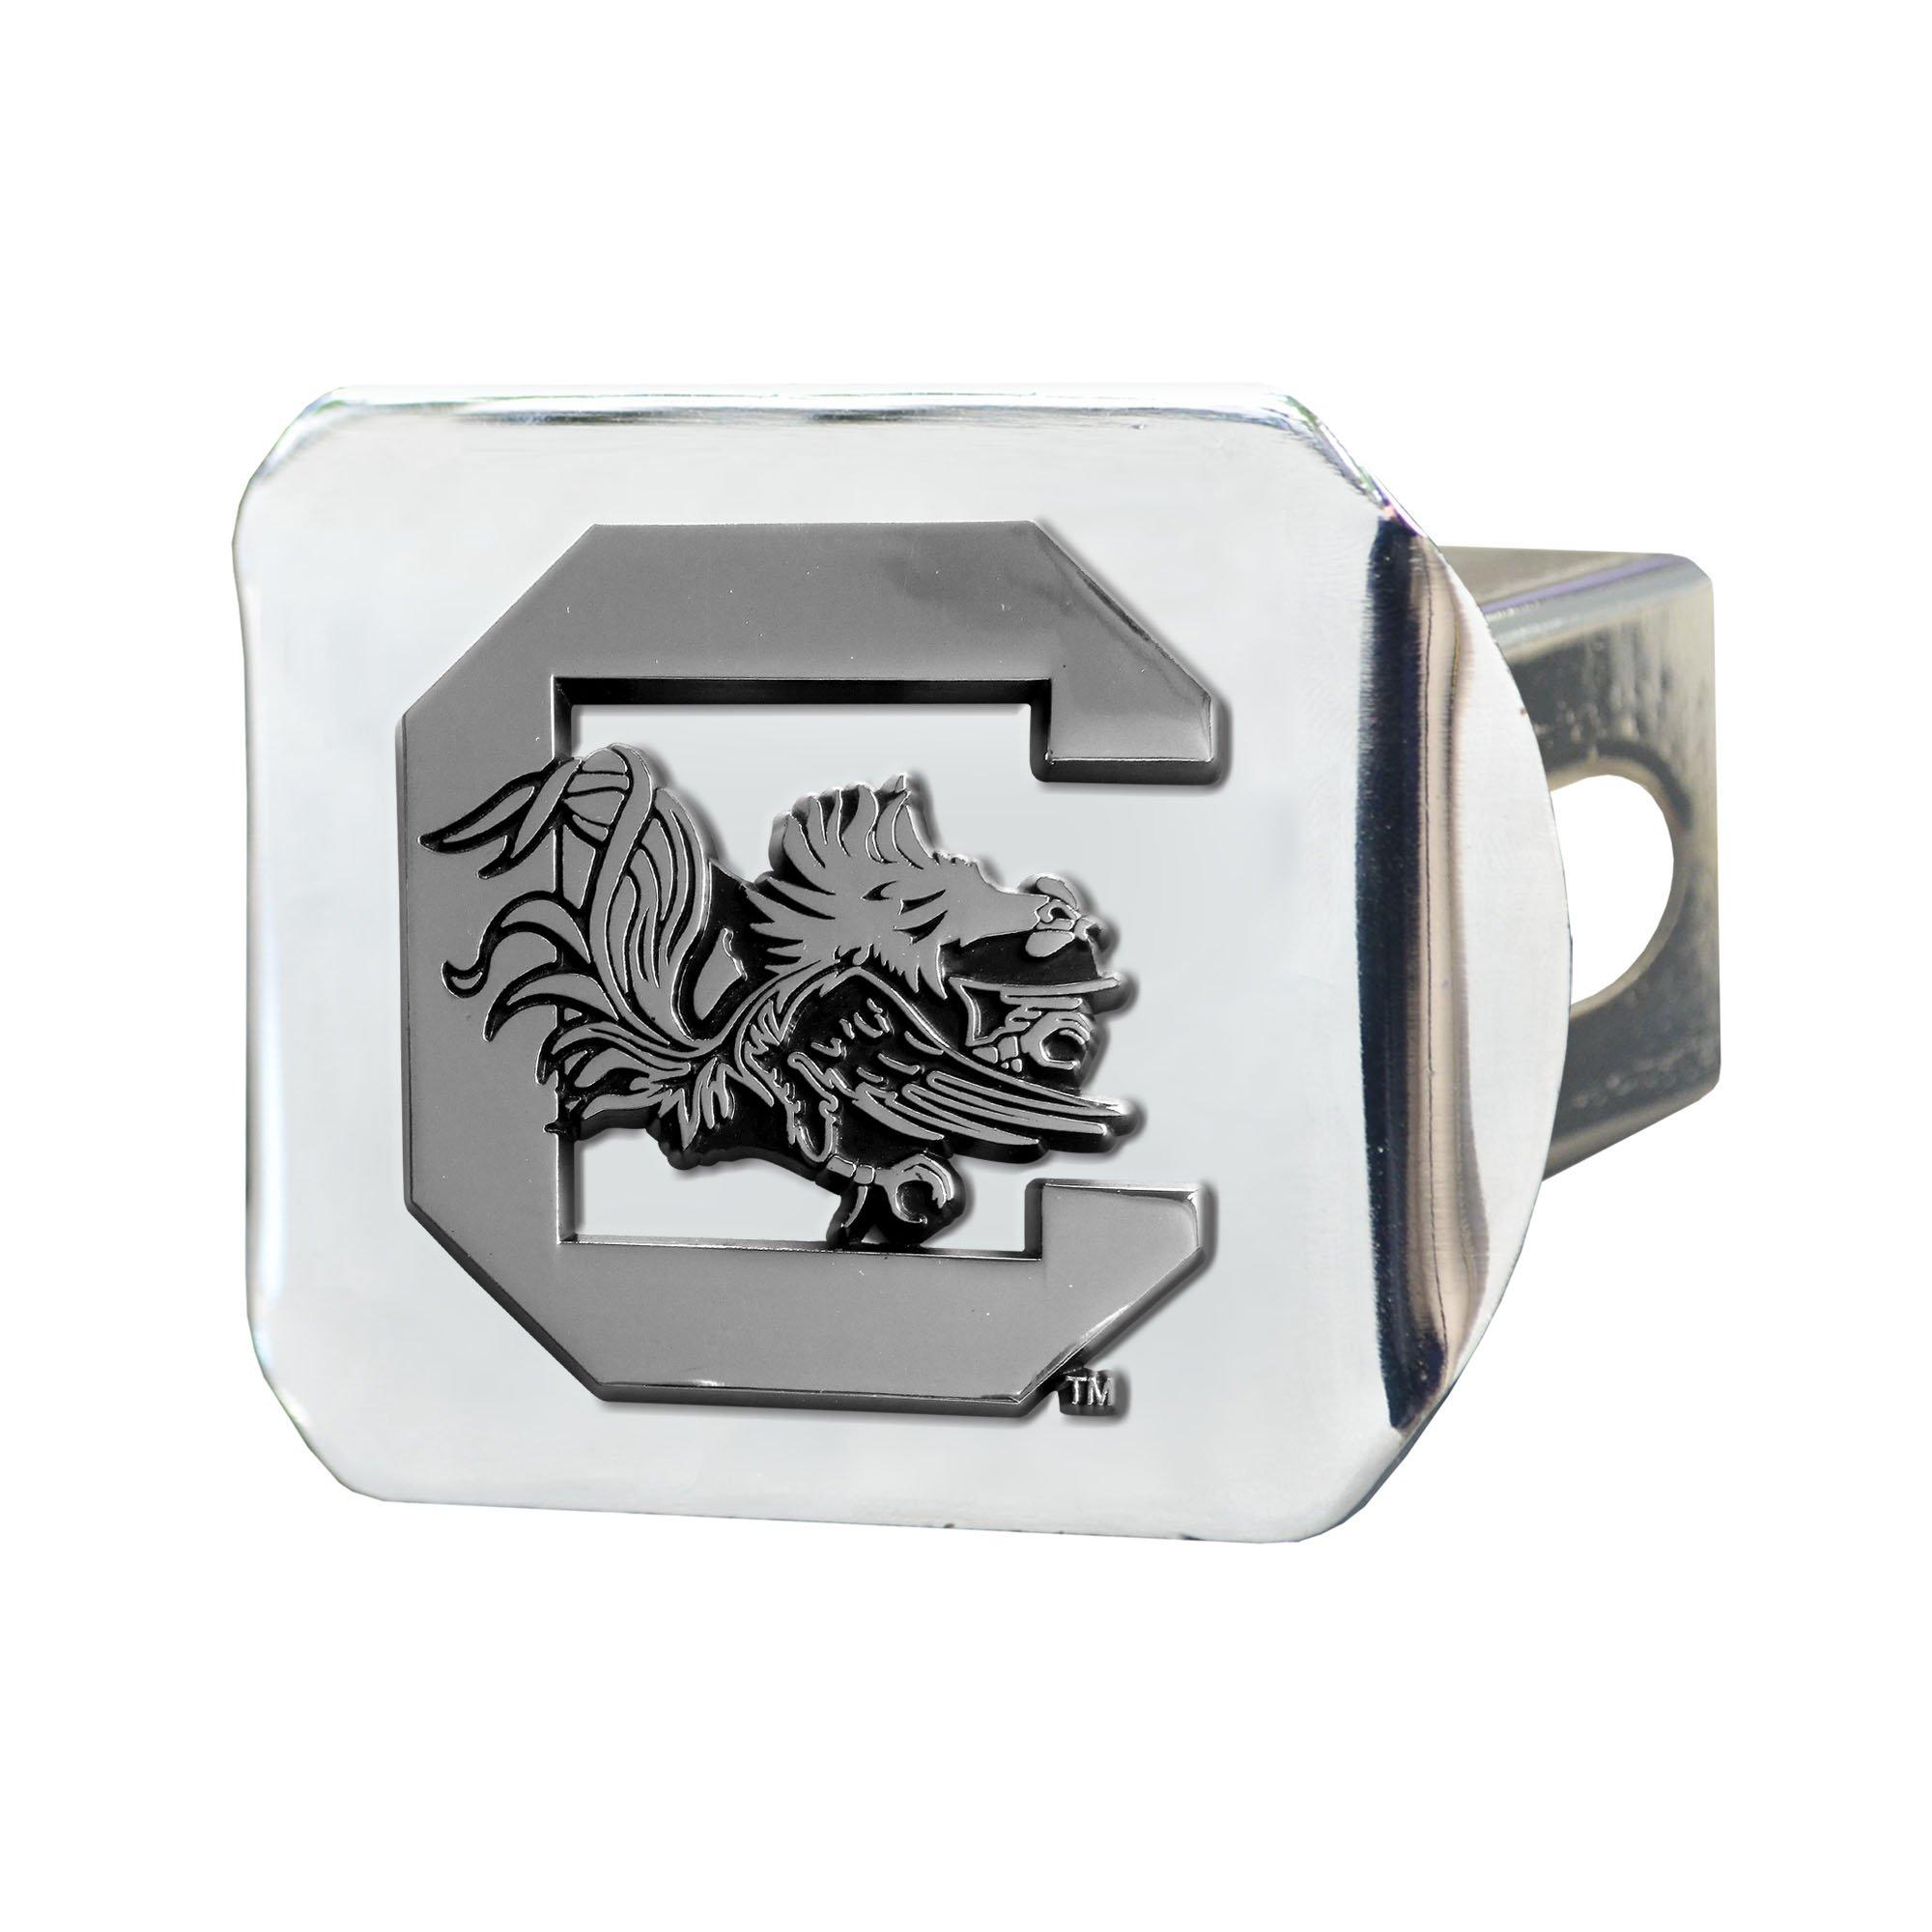 FANMATS NCAA University of South Carolina Gamecocks Chrome Hitch Cover